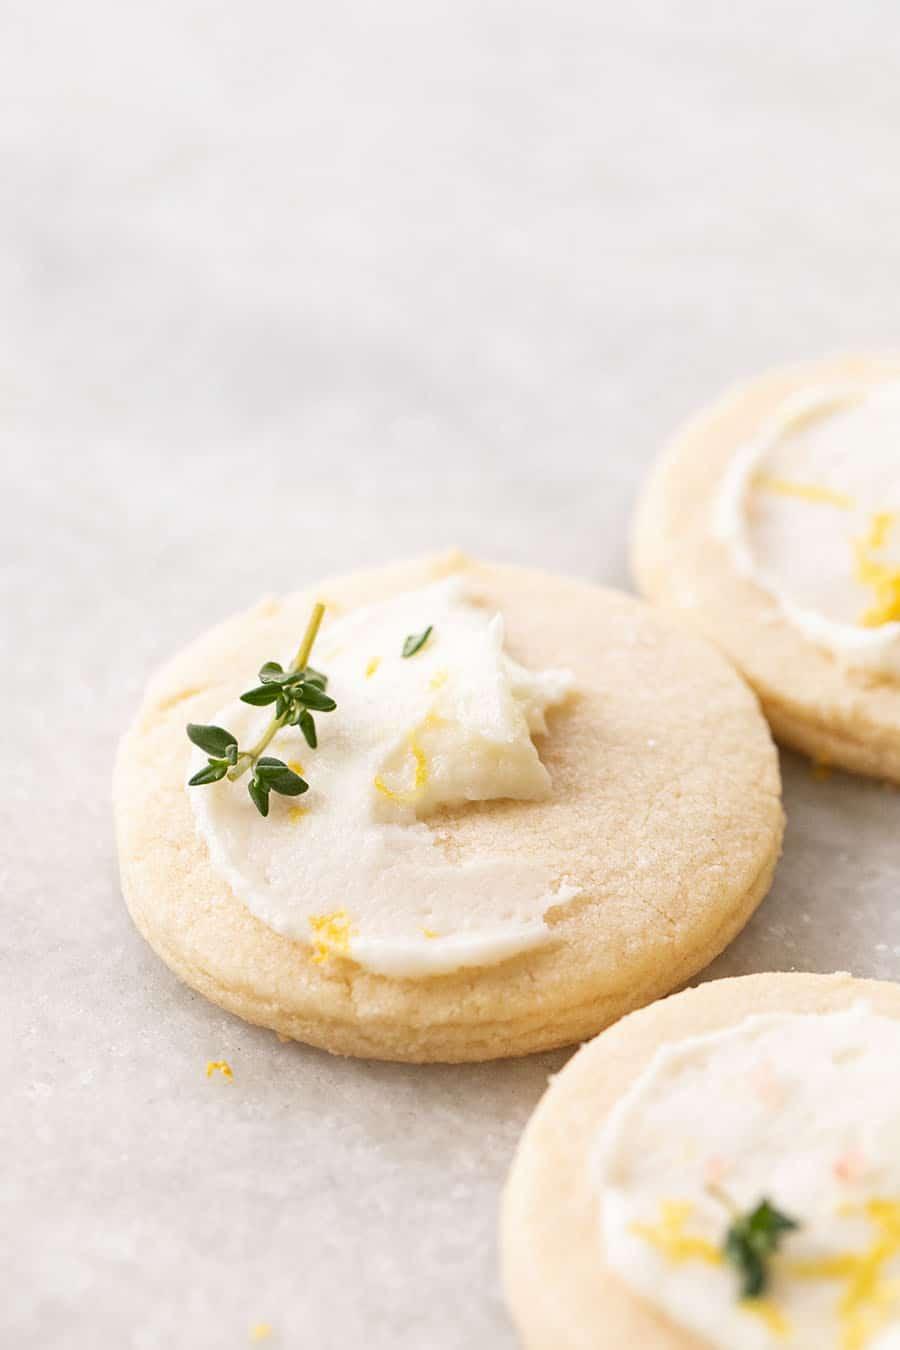 lemon and thyme shortbread cookies